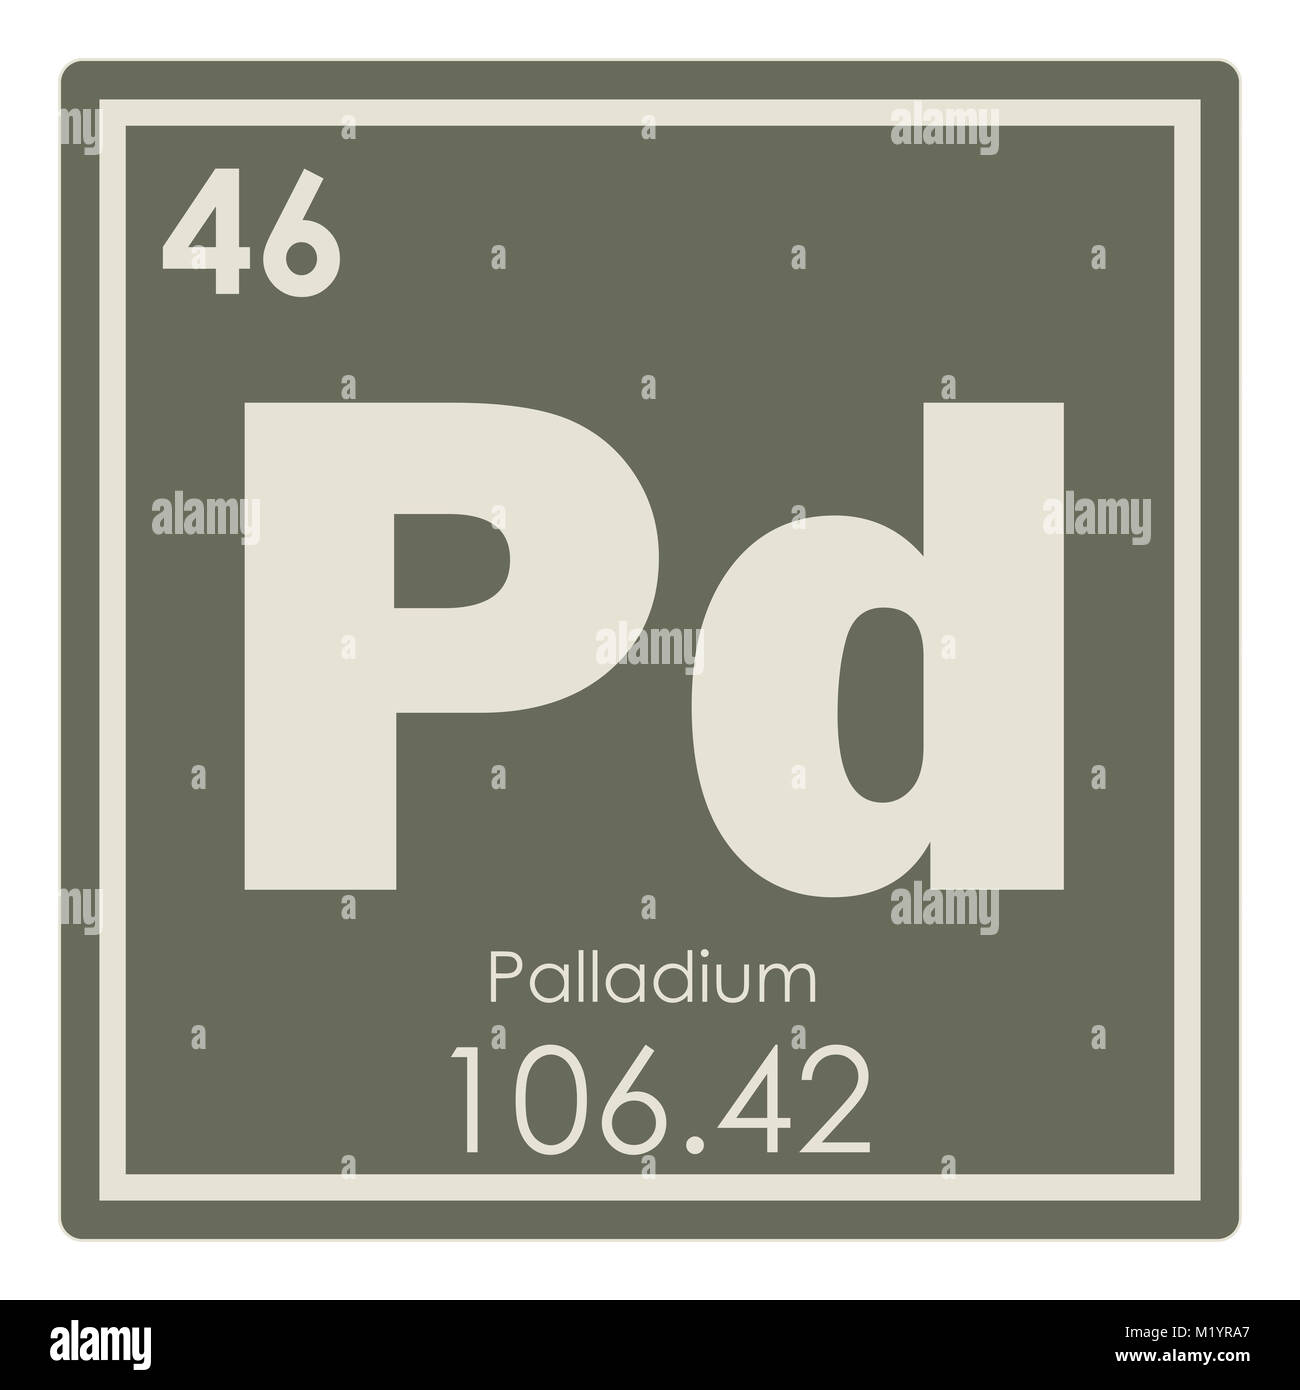 Palladium Chemical Element Periodic Table Science Symbol Stock Photo